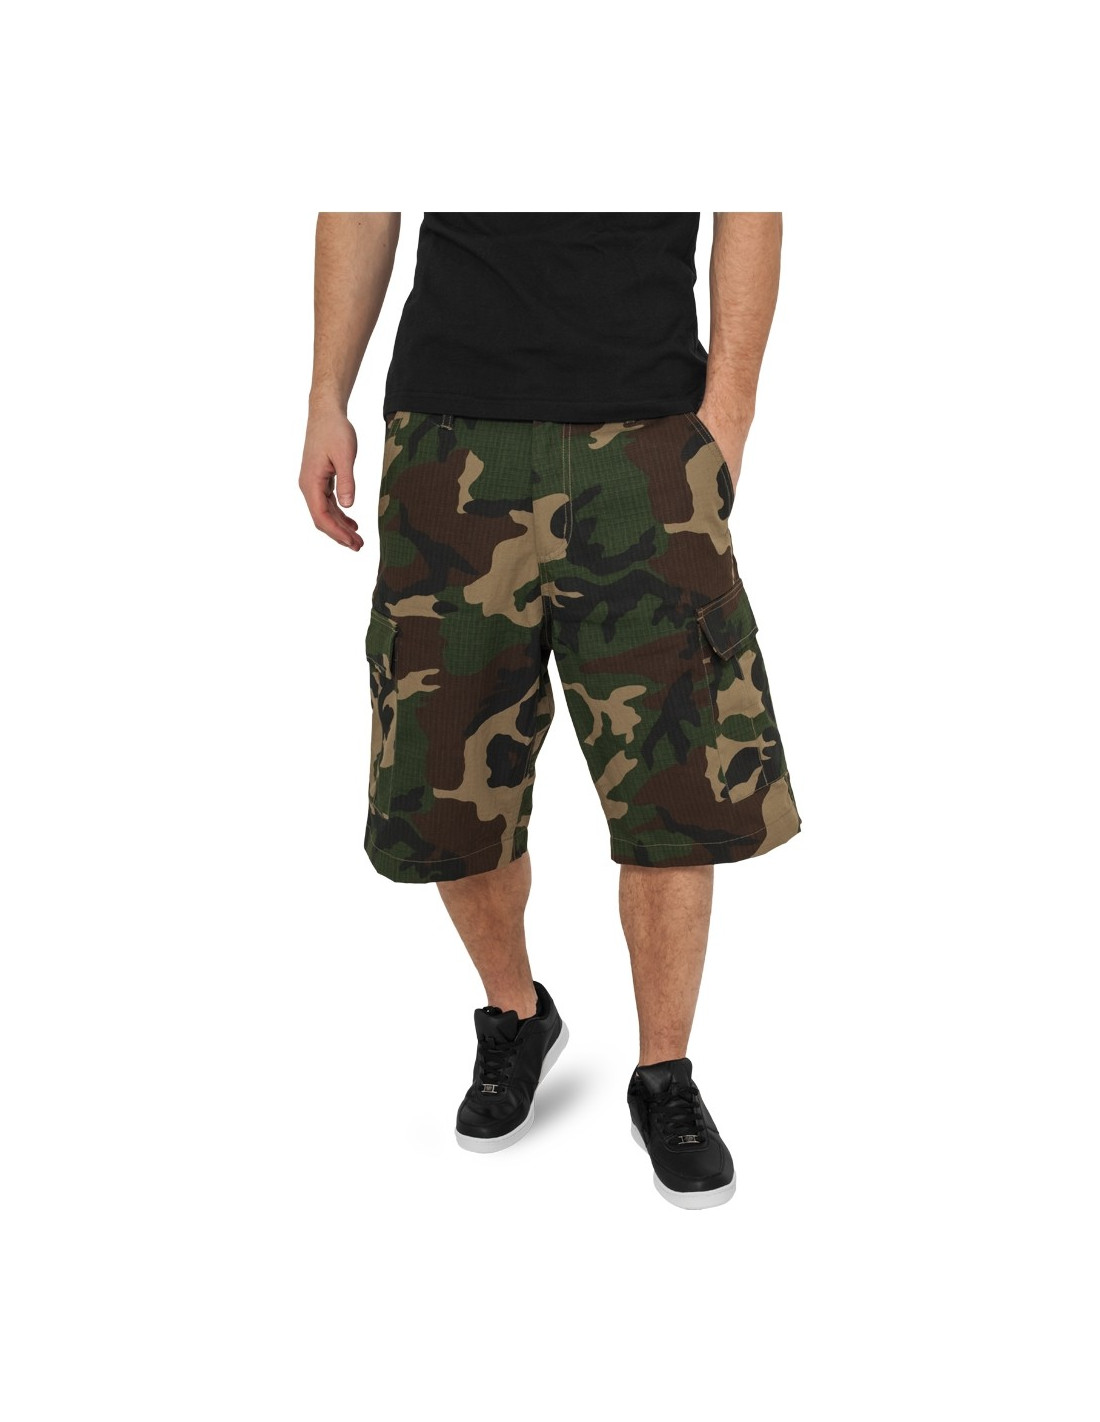 Urban Camouflage Cargo Shorts wood camo